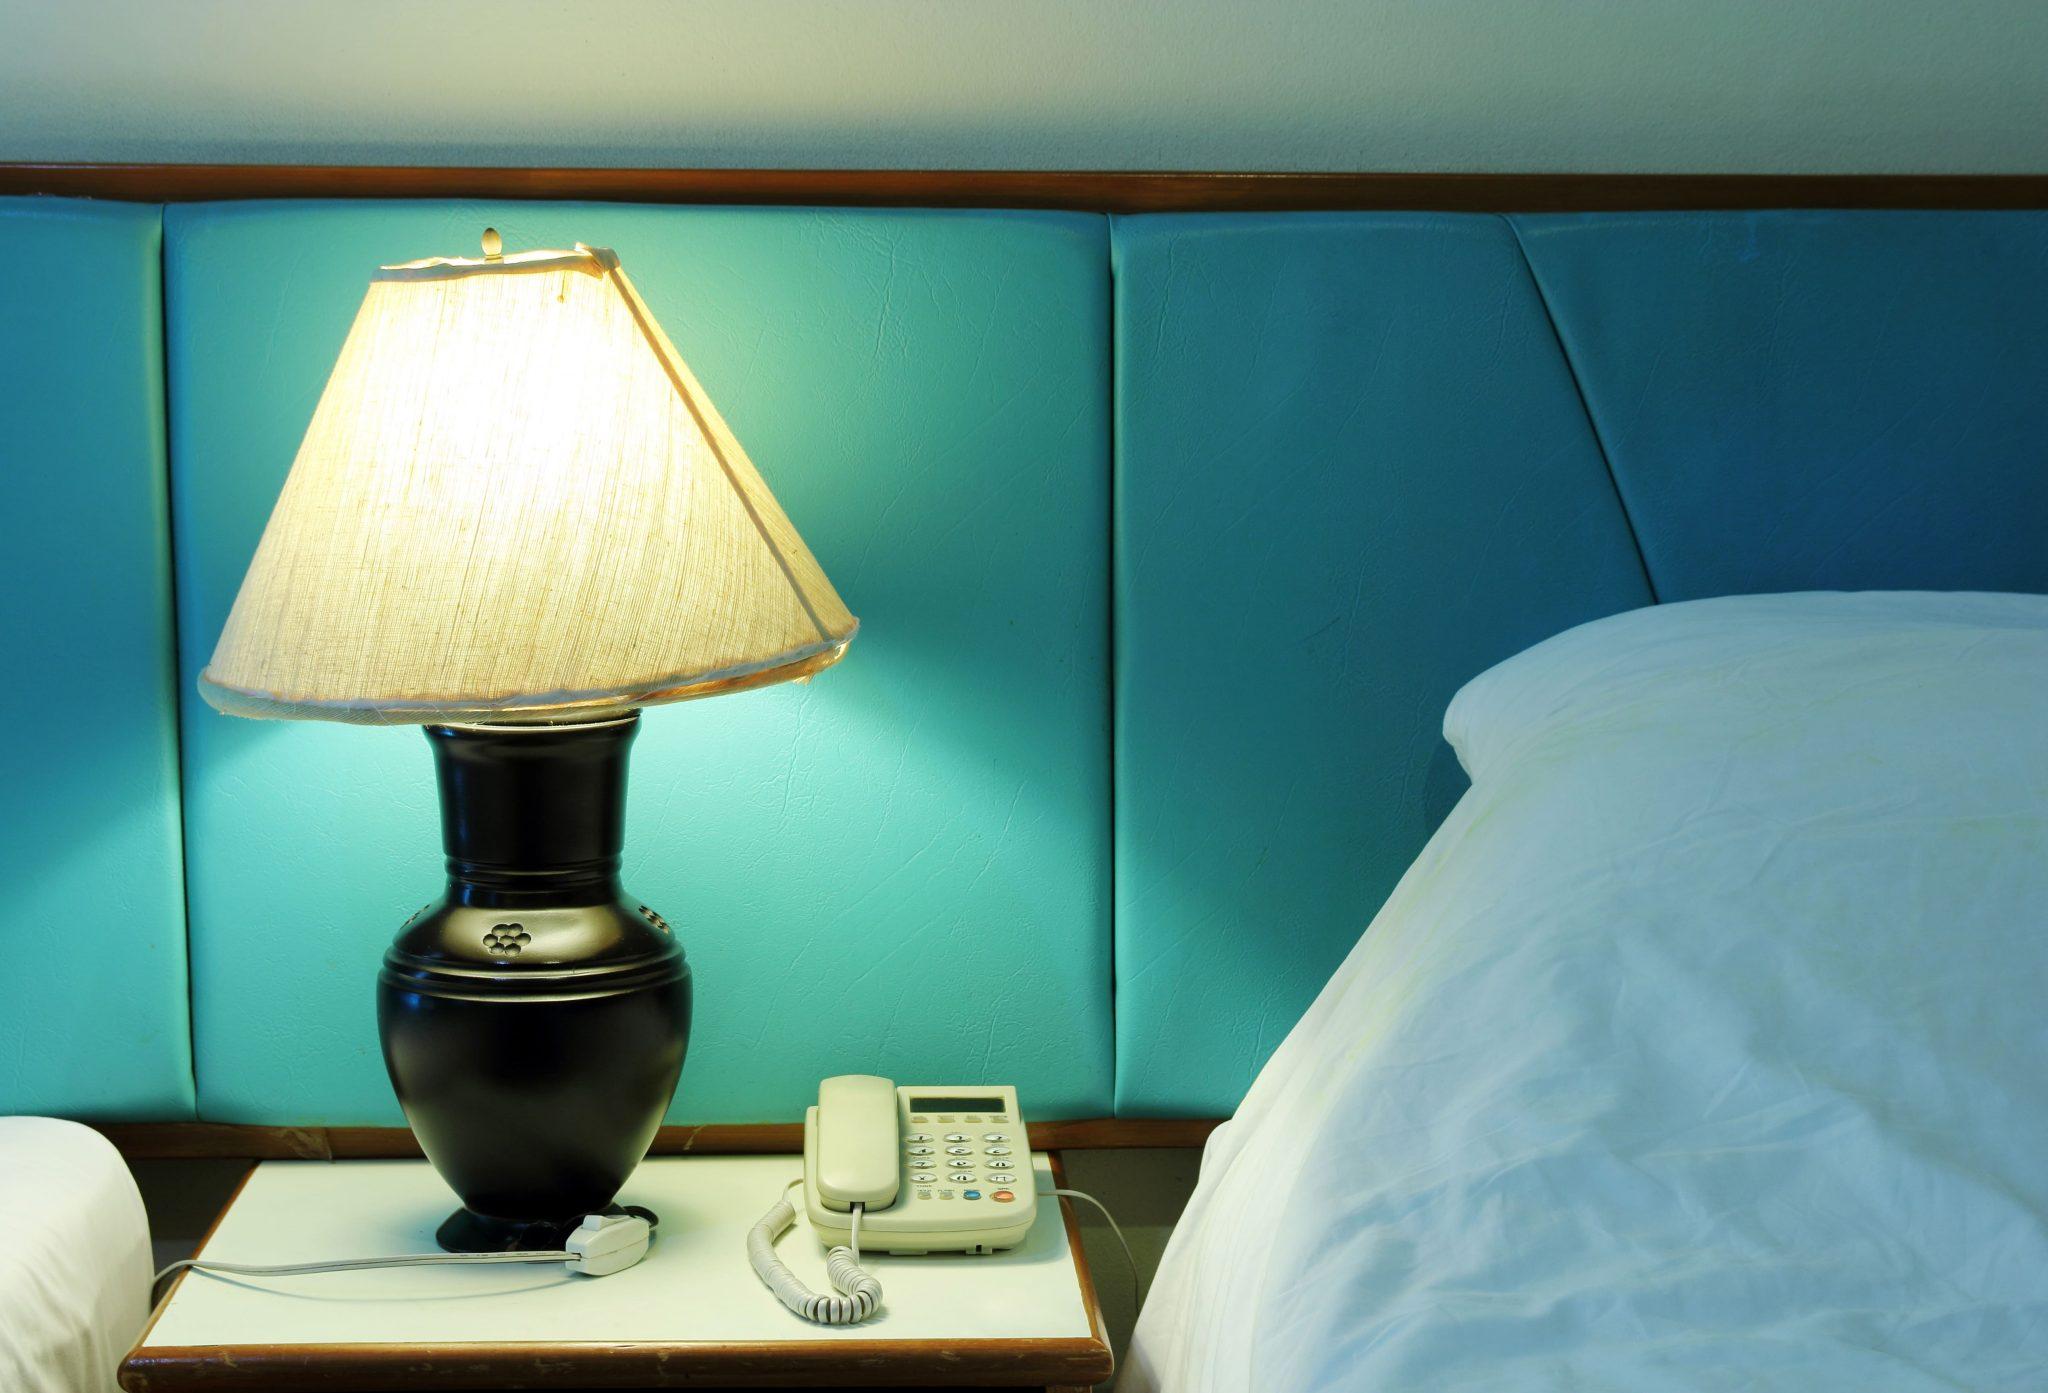 Light lamp switch on